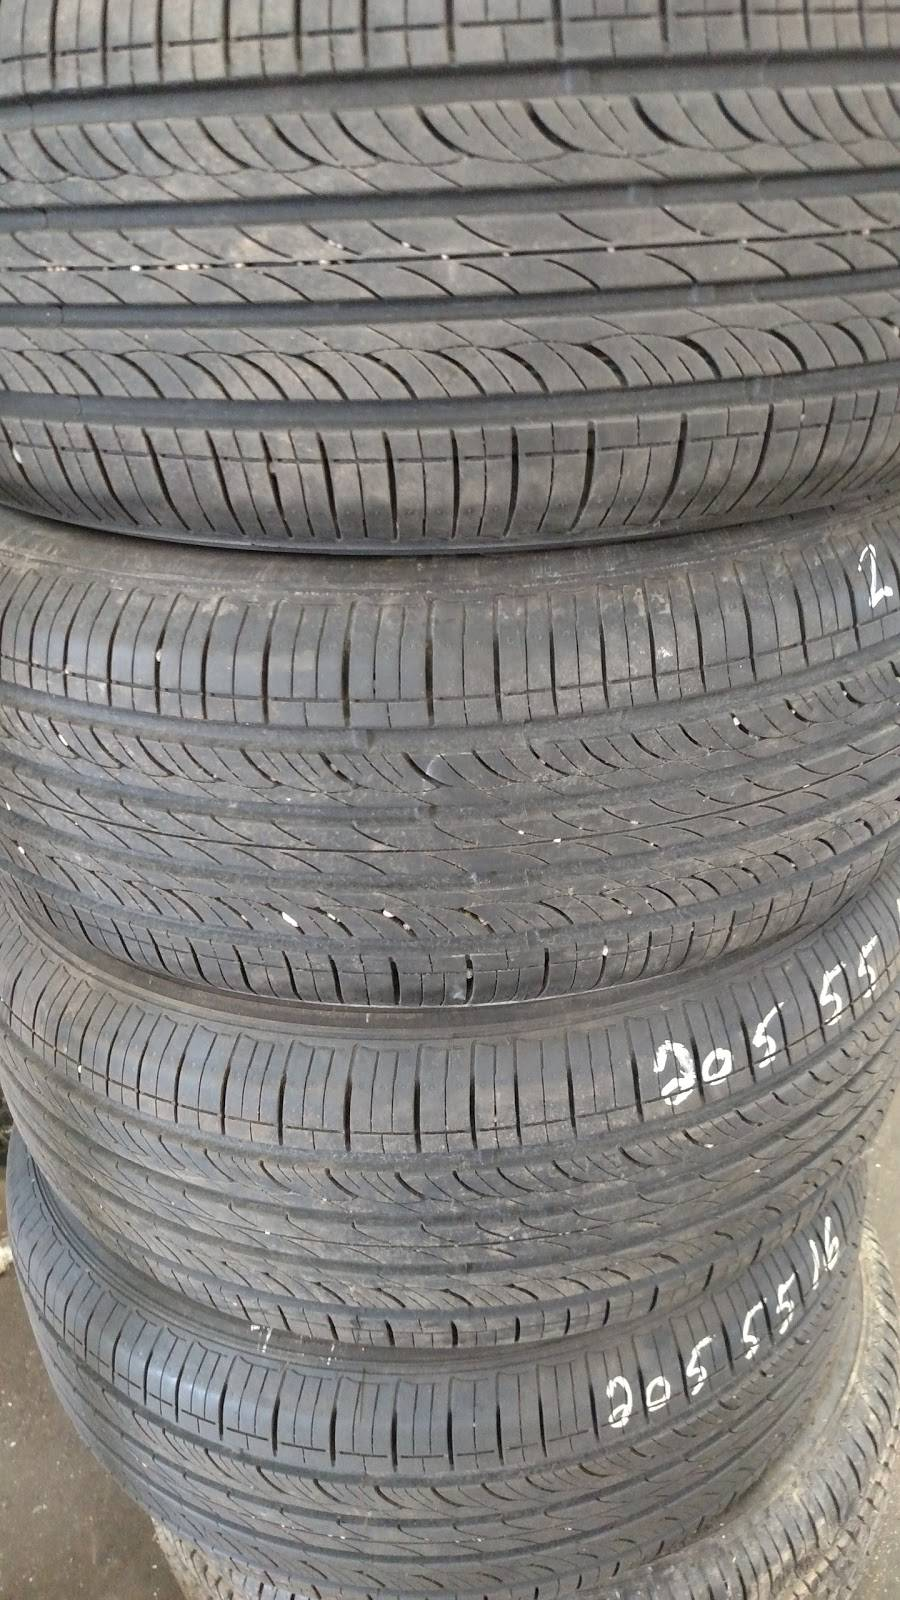 Tire Stop INC - car repair    Photo 9 of 9   Address: 2015 Freeport Rd, Arnold, PA 15068, USA   Phone: (724) 594-0325